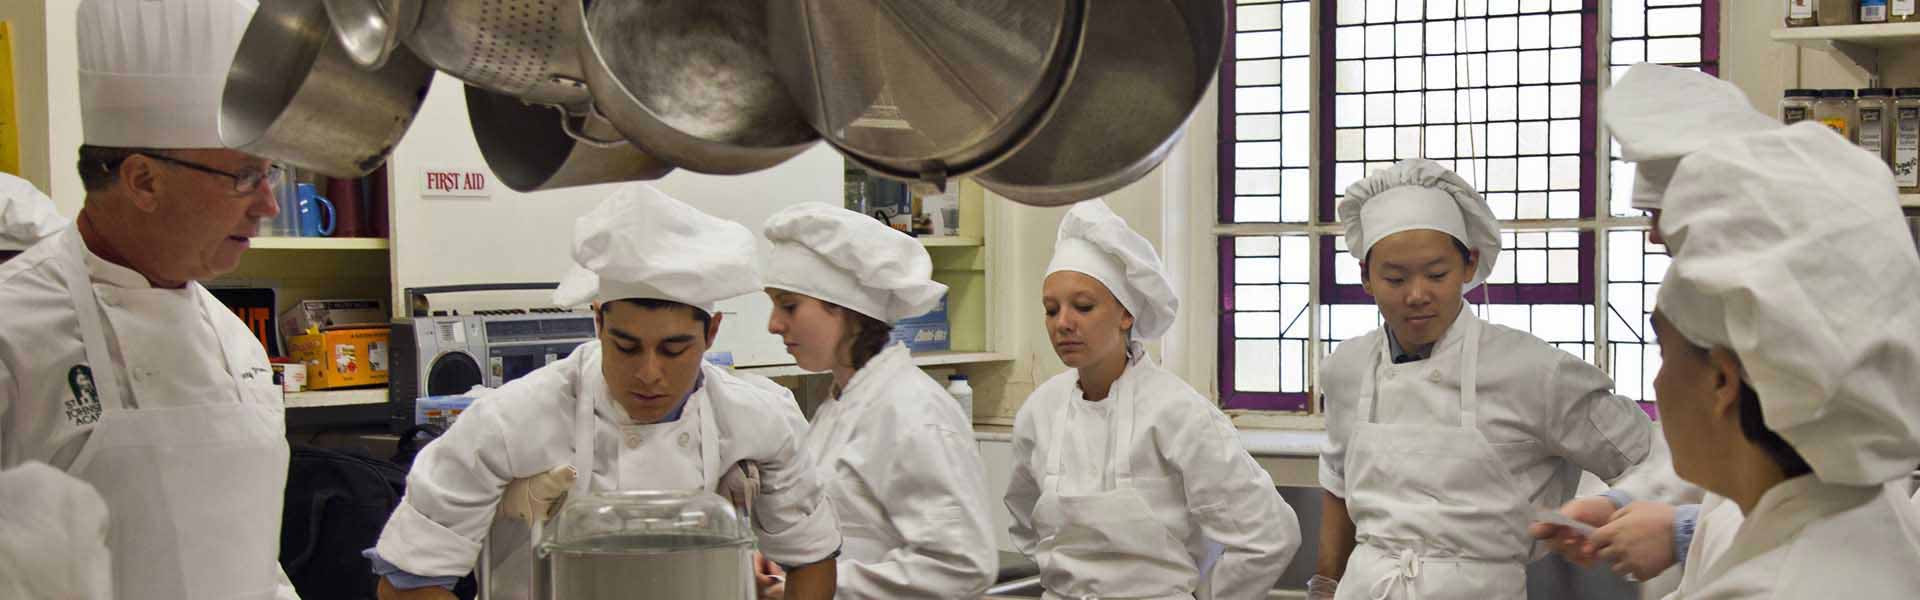 StJohnsbury-Highschool-VT-Cooking-MAin-BAnner